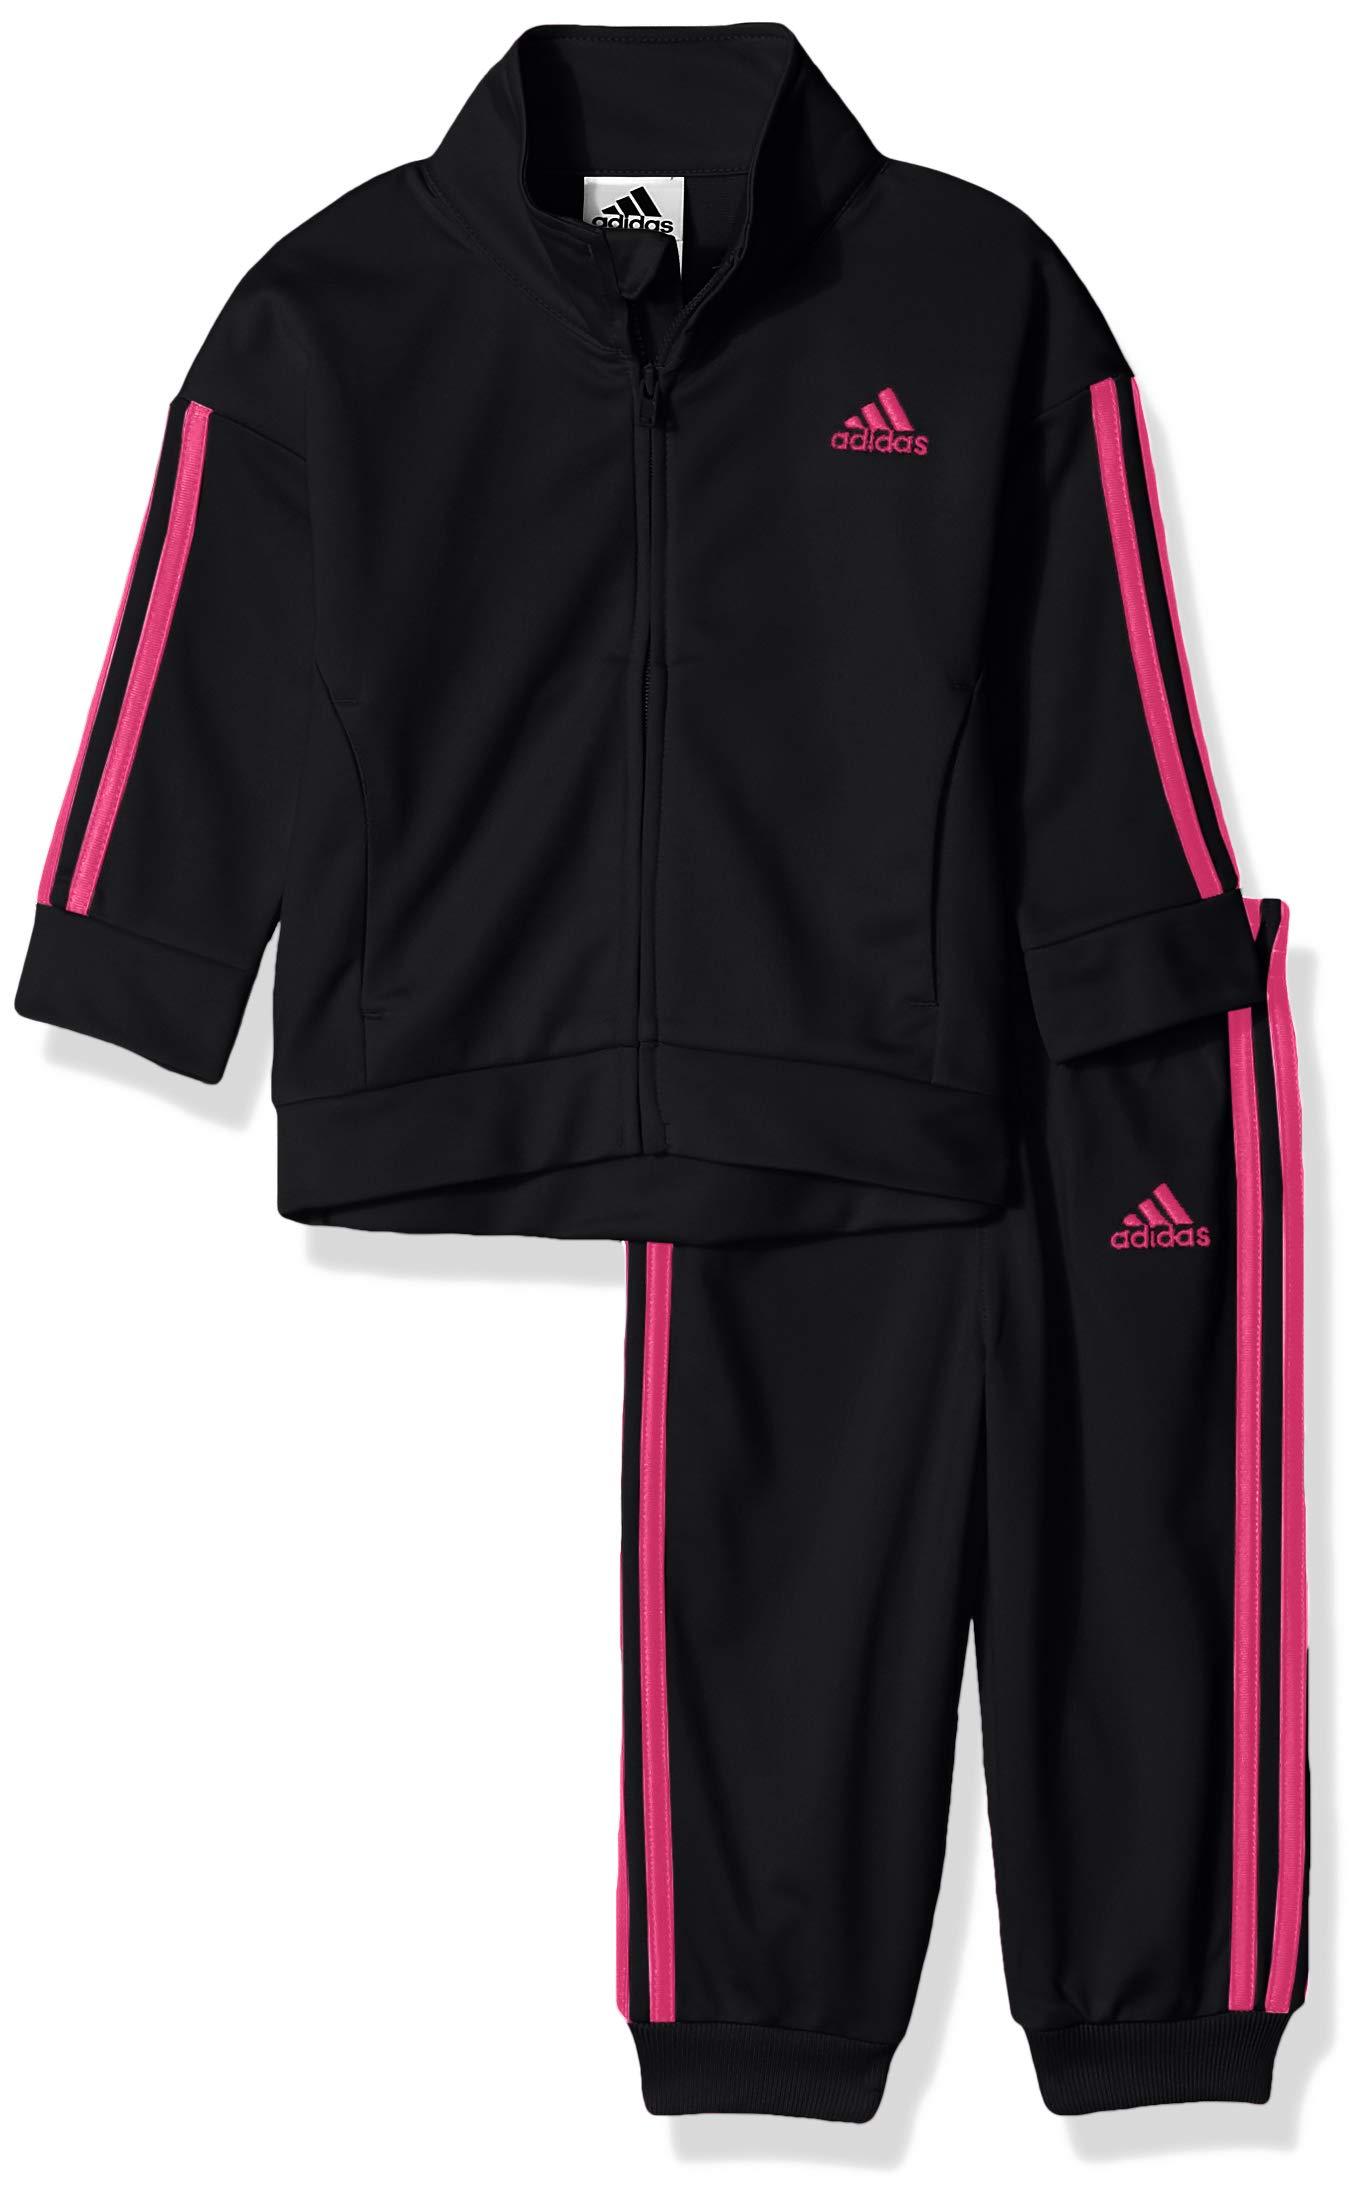 adidas Baby Girls Zip Jacket and Pant Set, Black, 12M